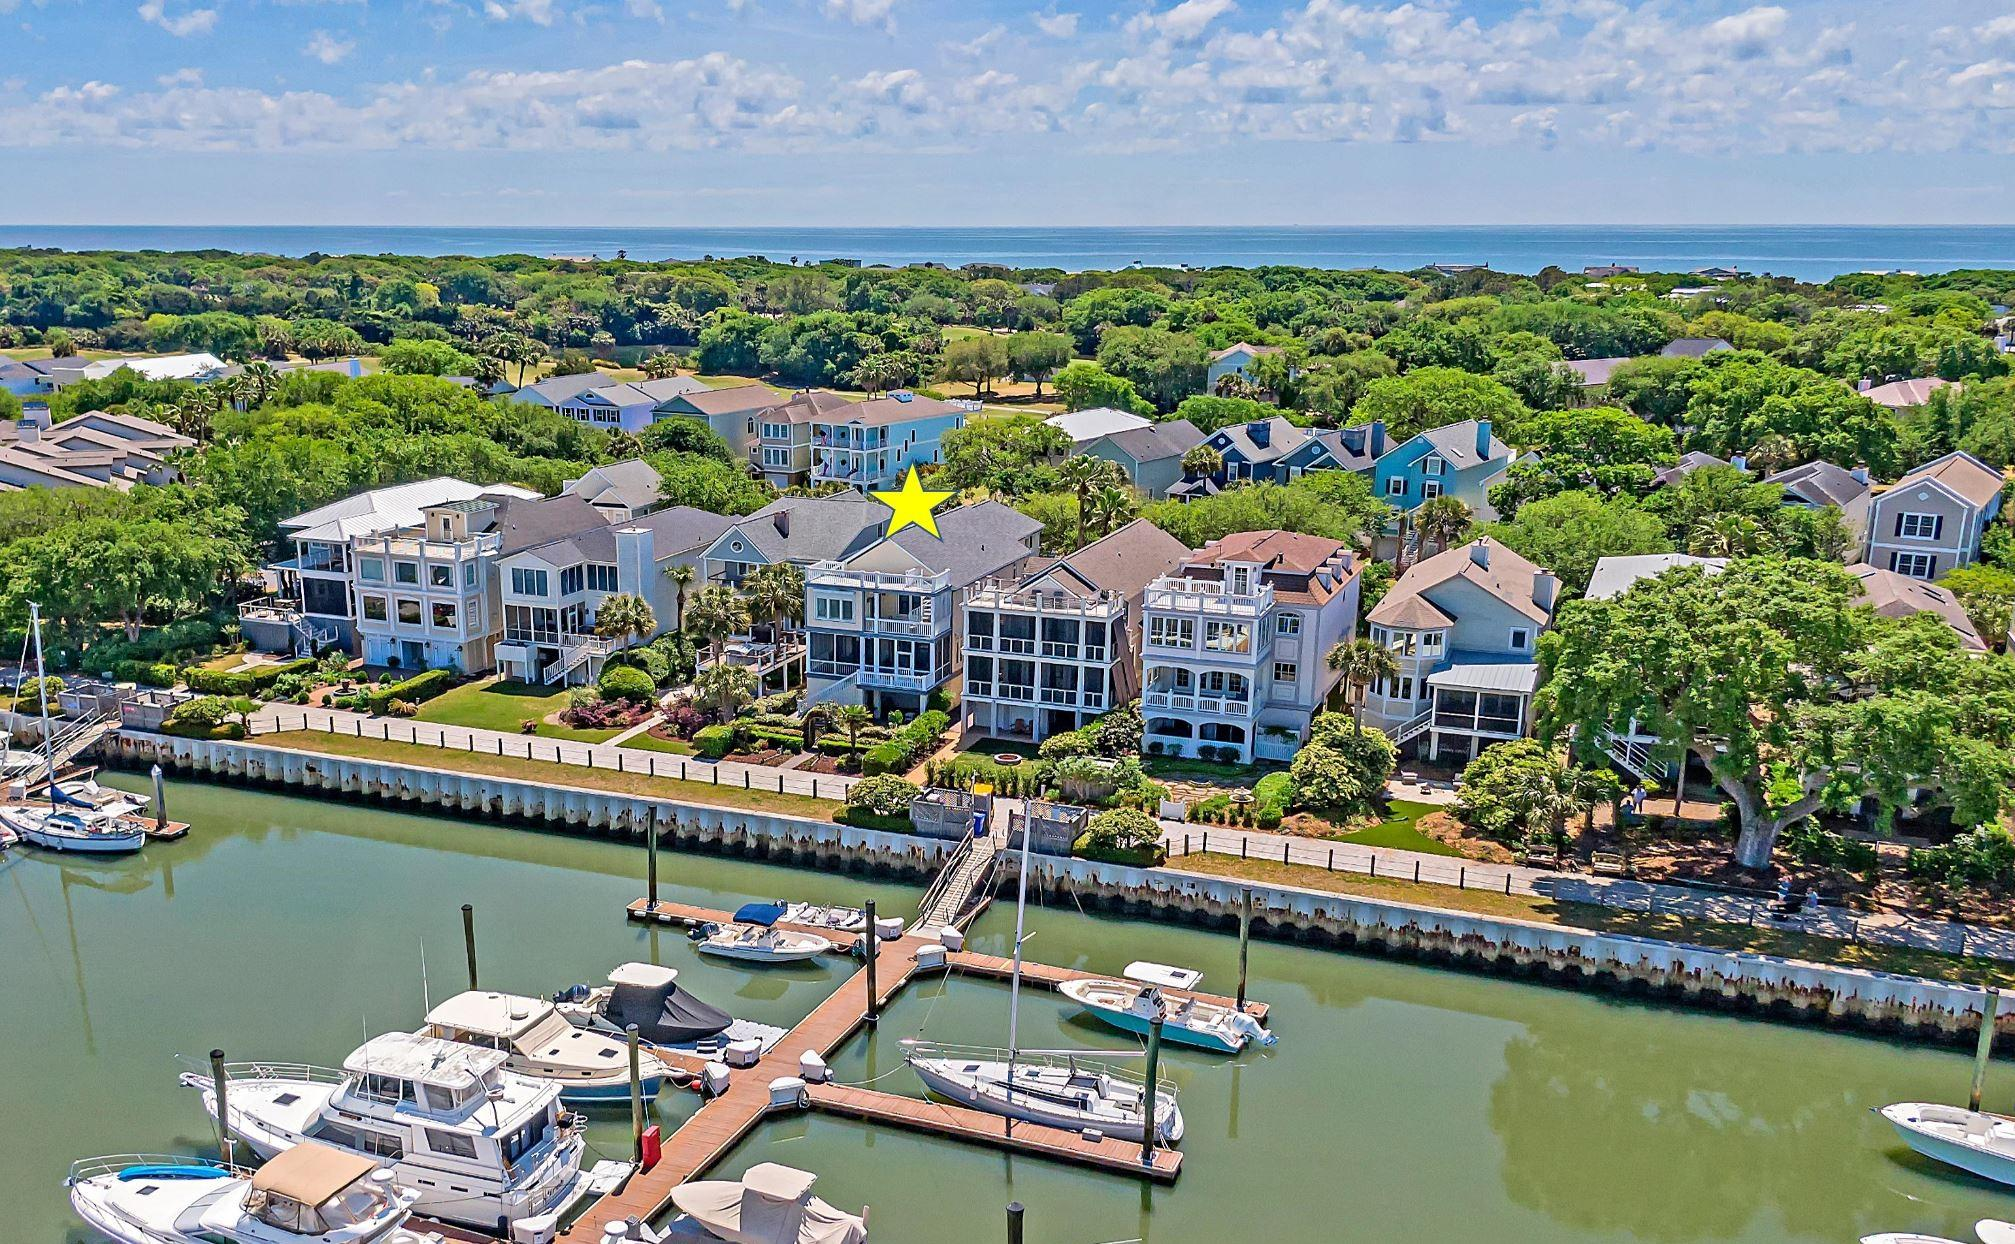 30 Yacht Harbor Court Isle of Palms $2,000,000.00